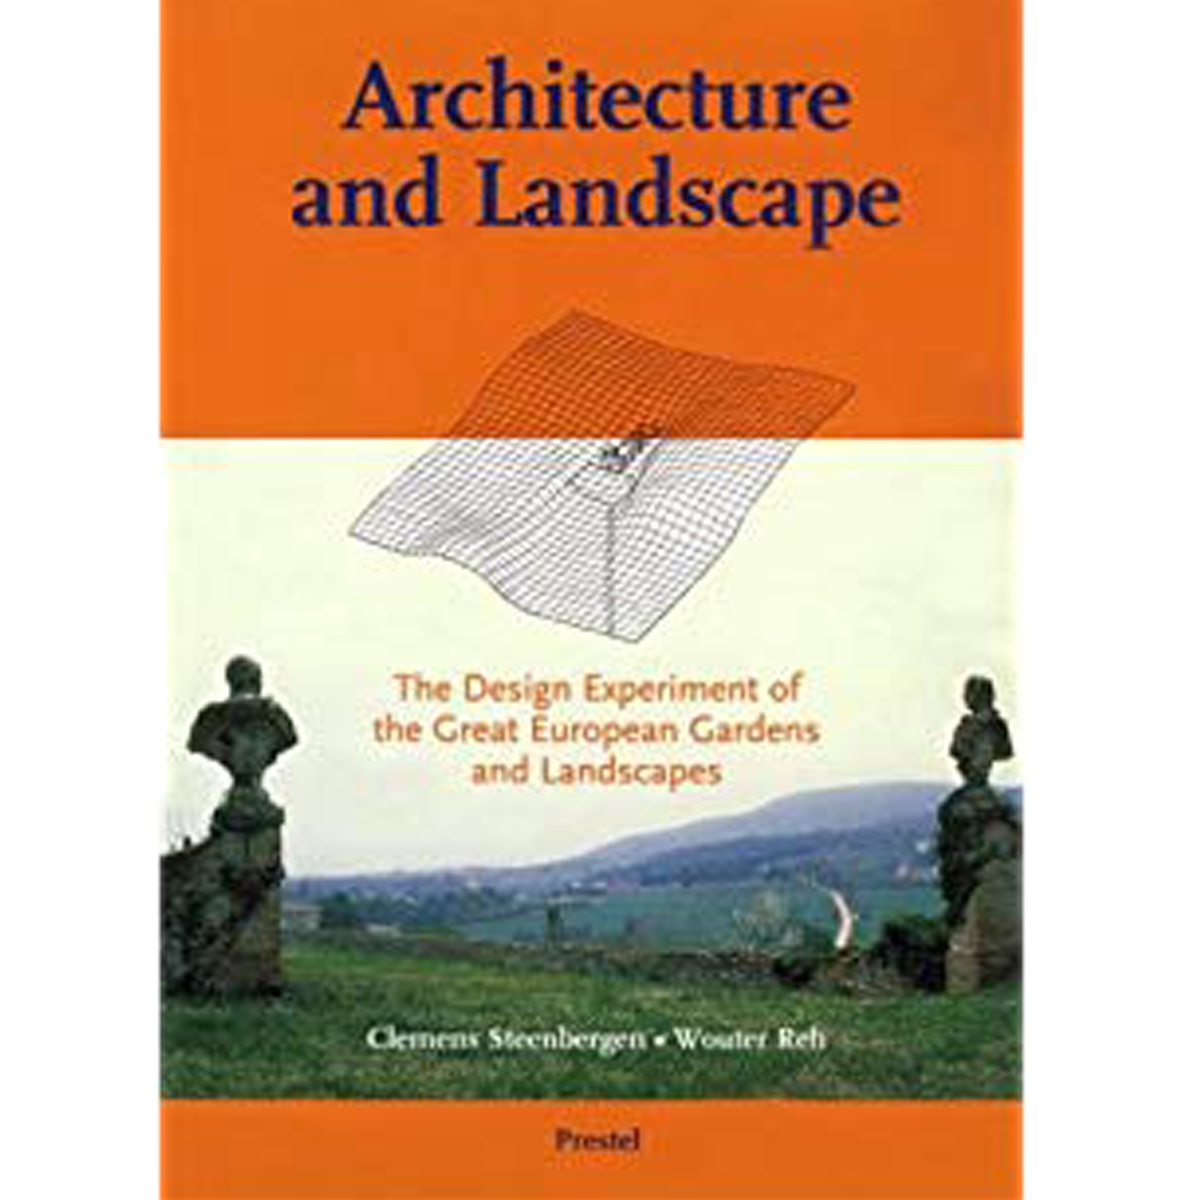 Architecture and Landscape